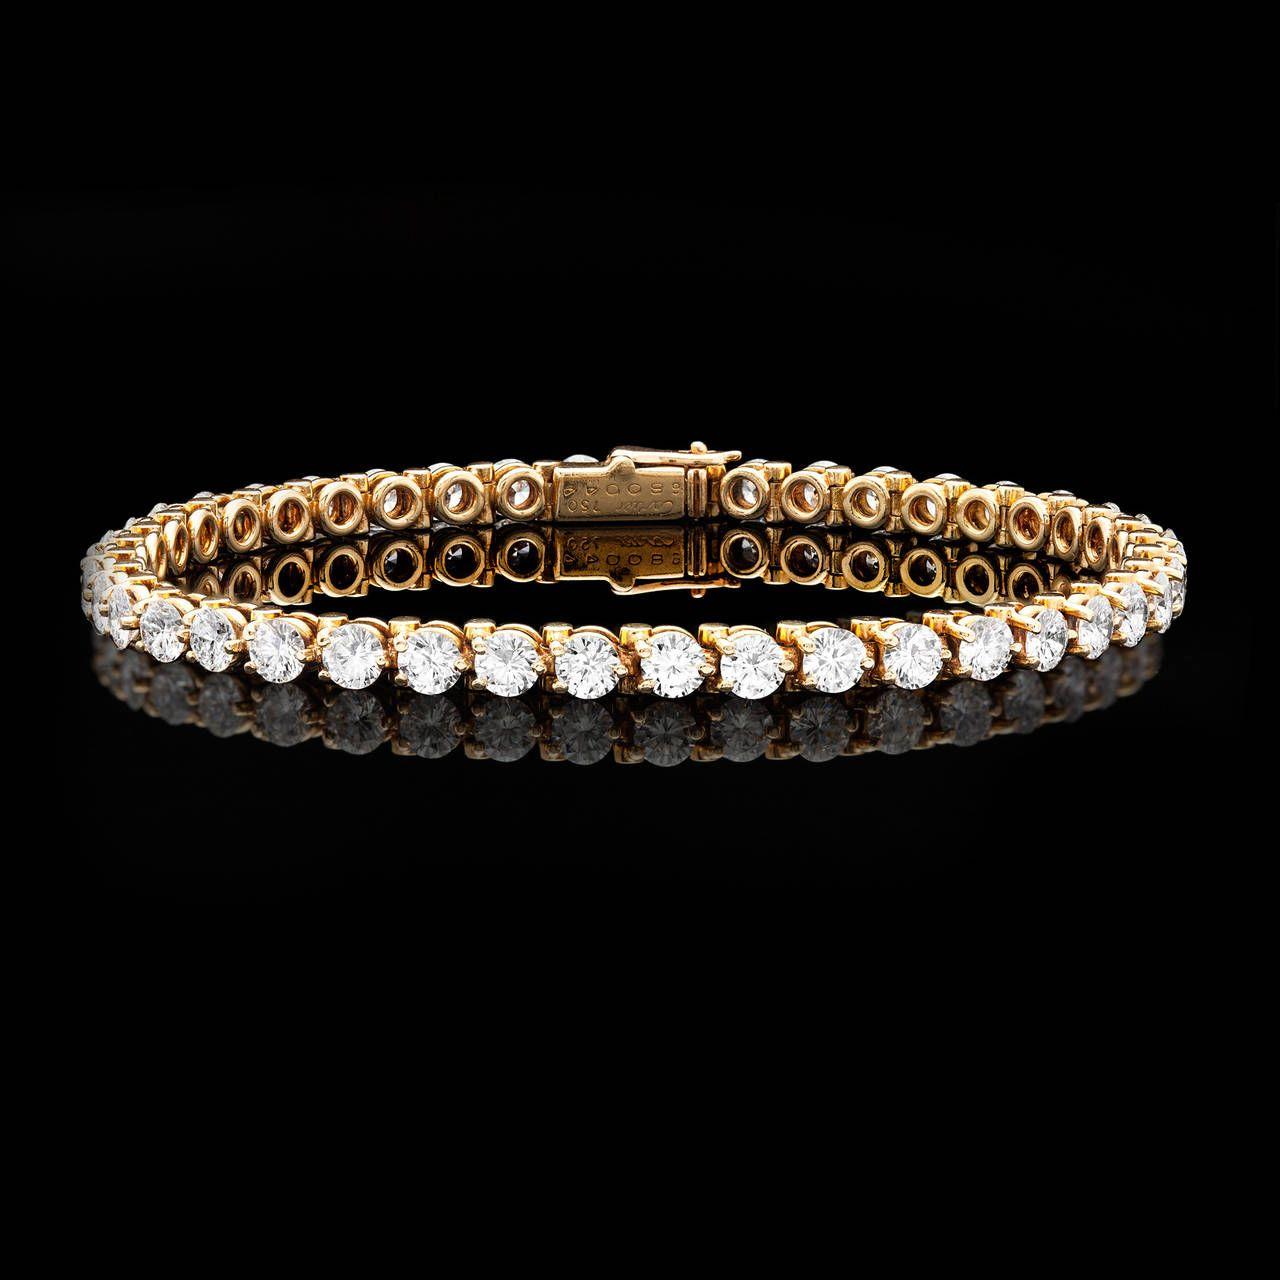 Cartier 6.30 Carat Diamond Gold Tennis Bracelet | From a unique collection of vintage tennis bracelets at https://www.1stdibs.com/jewelry/bracelets/tennis-bracelets/